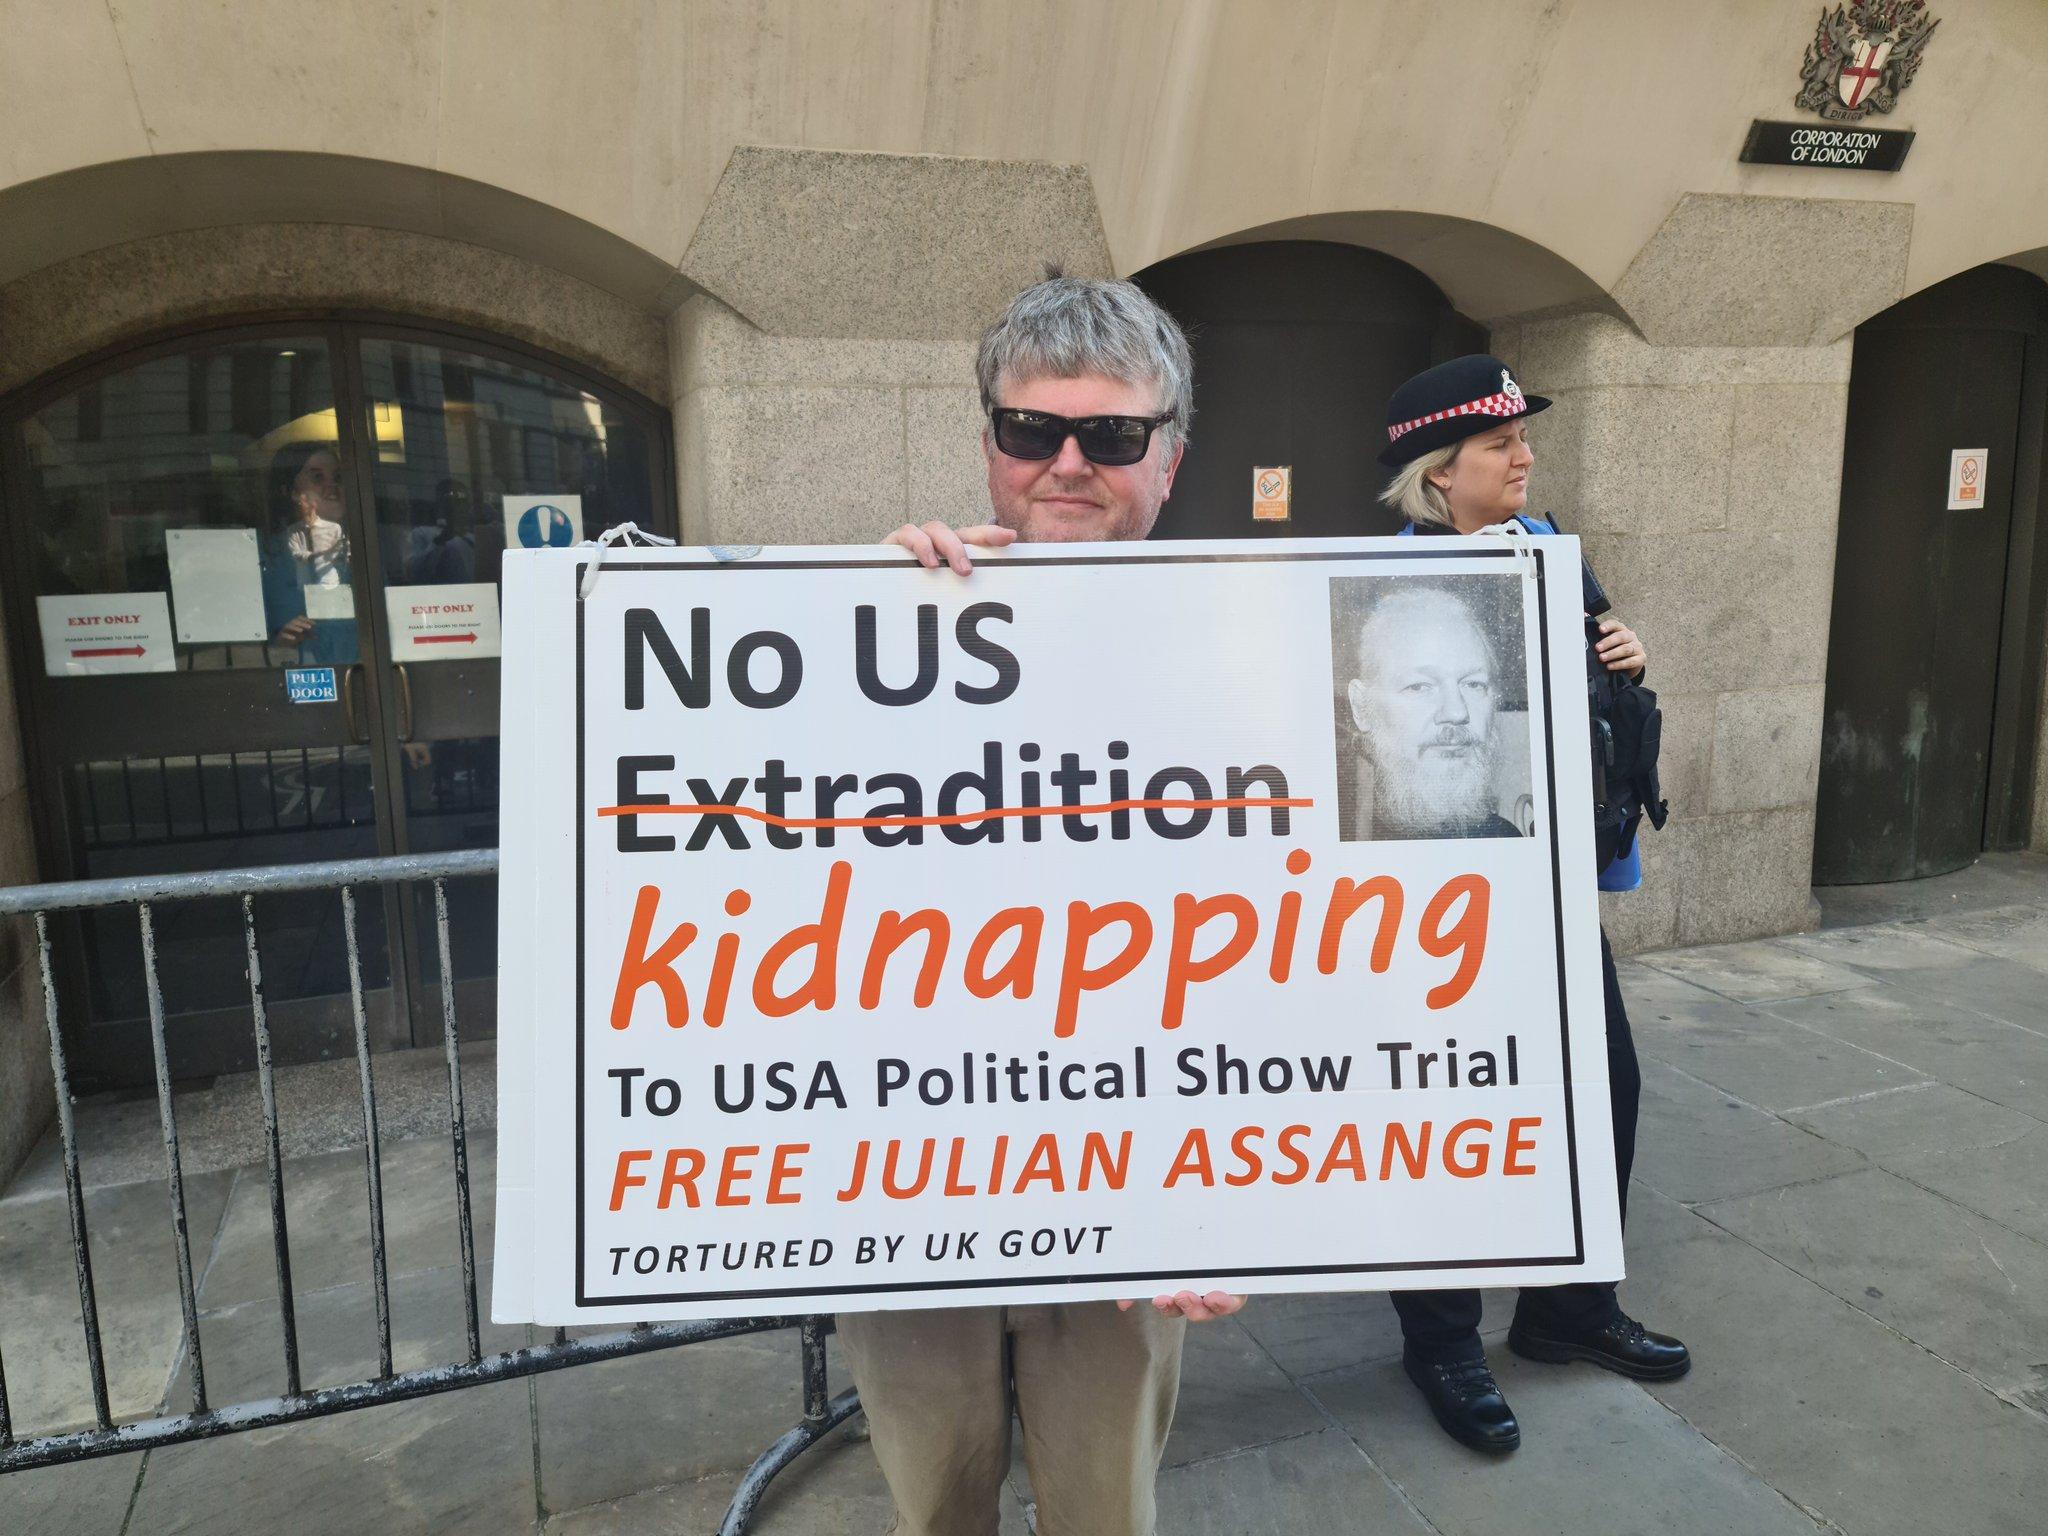 no-us-kidnapping-old-bailey-sept20.jpeg